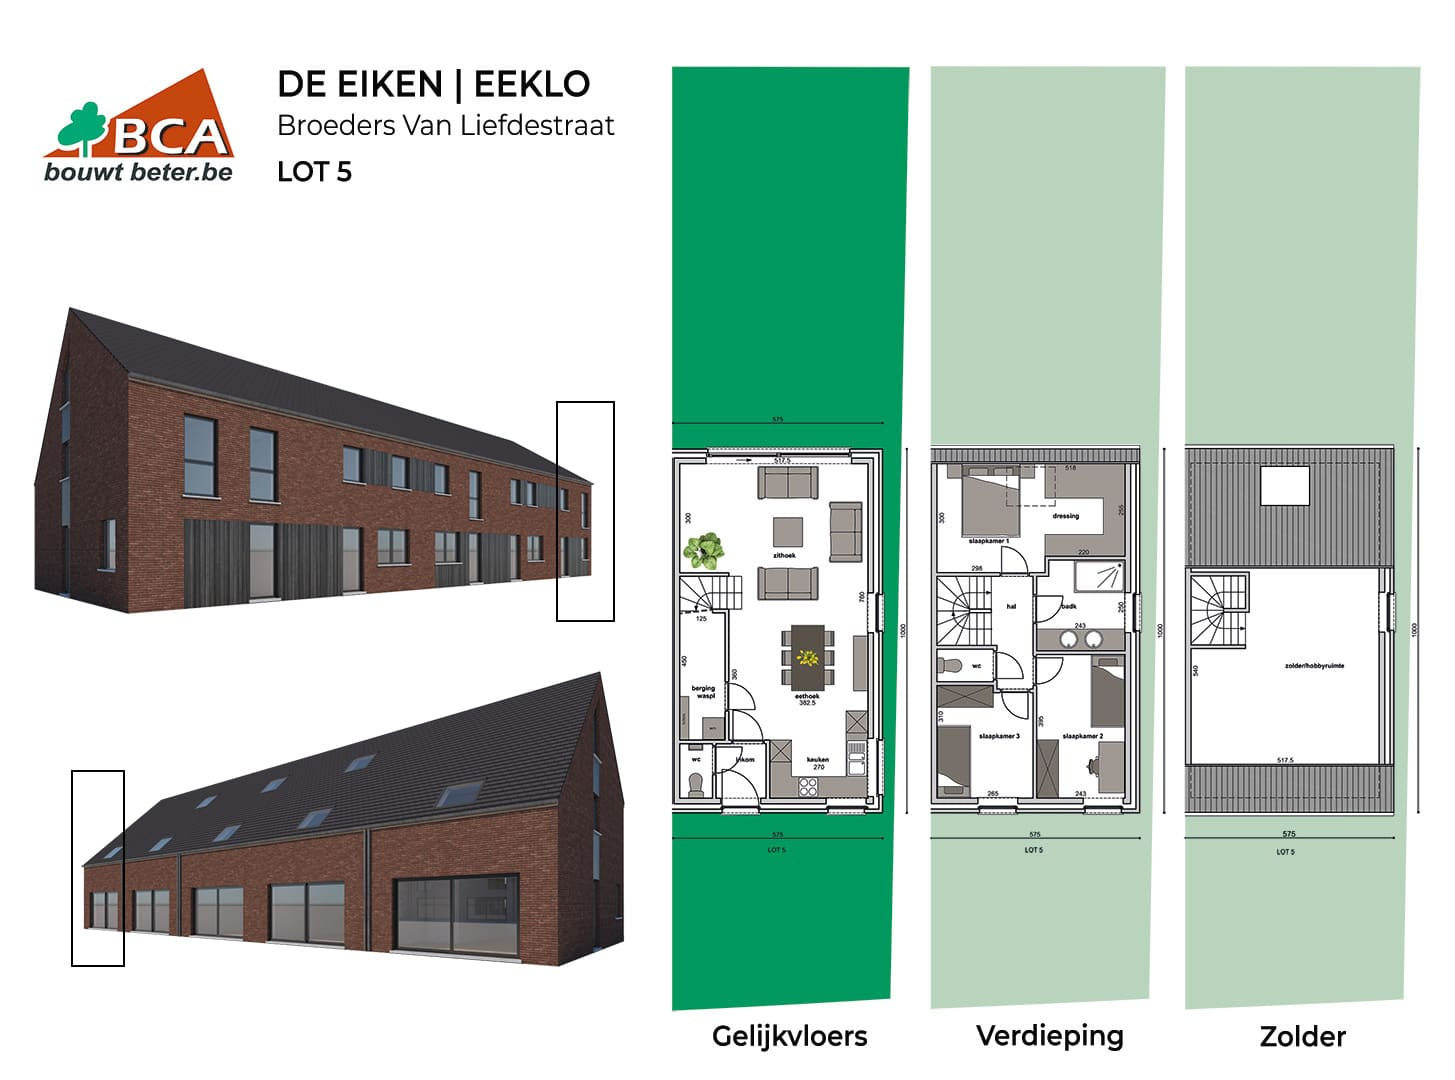 Eeklo-de-eiken-plannen-lot-5